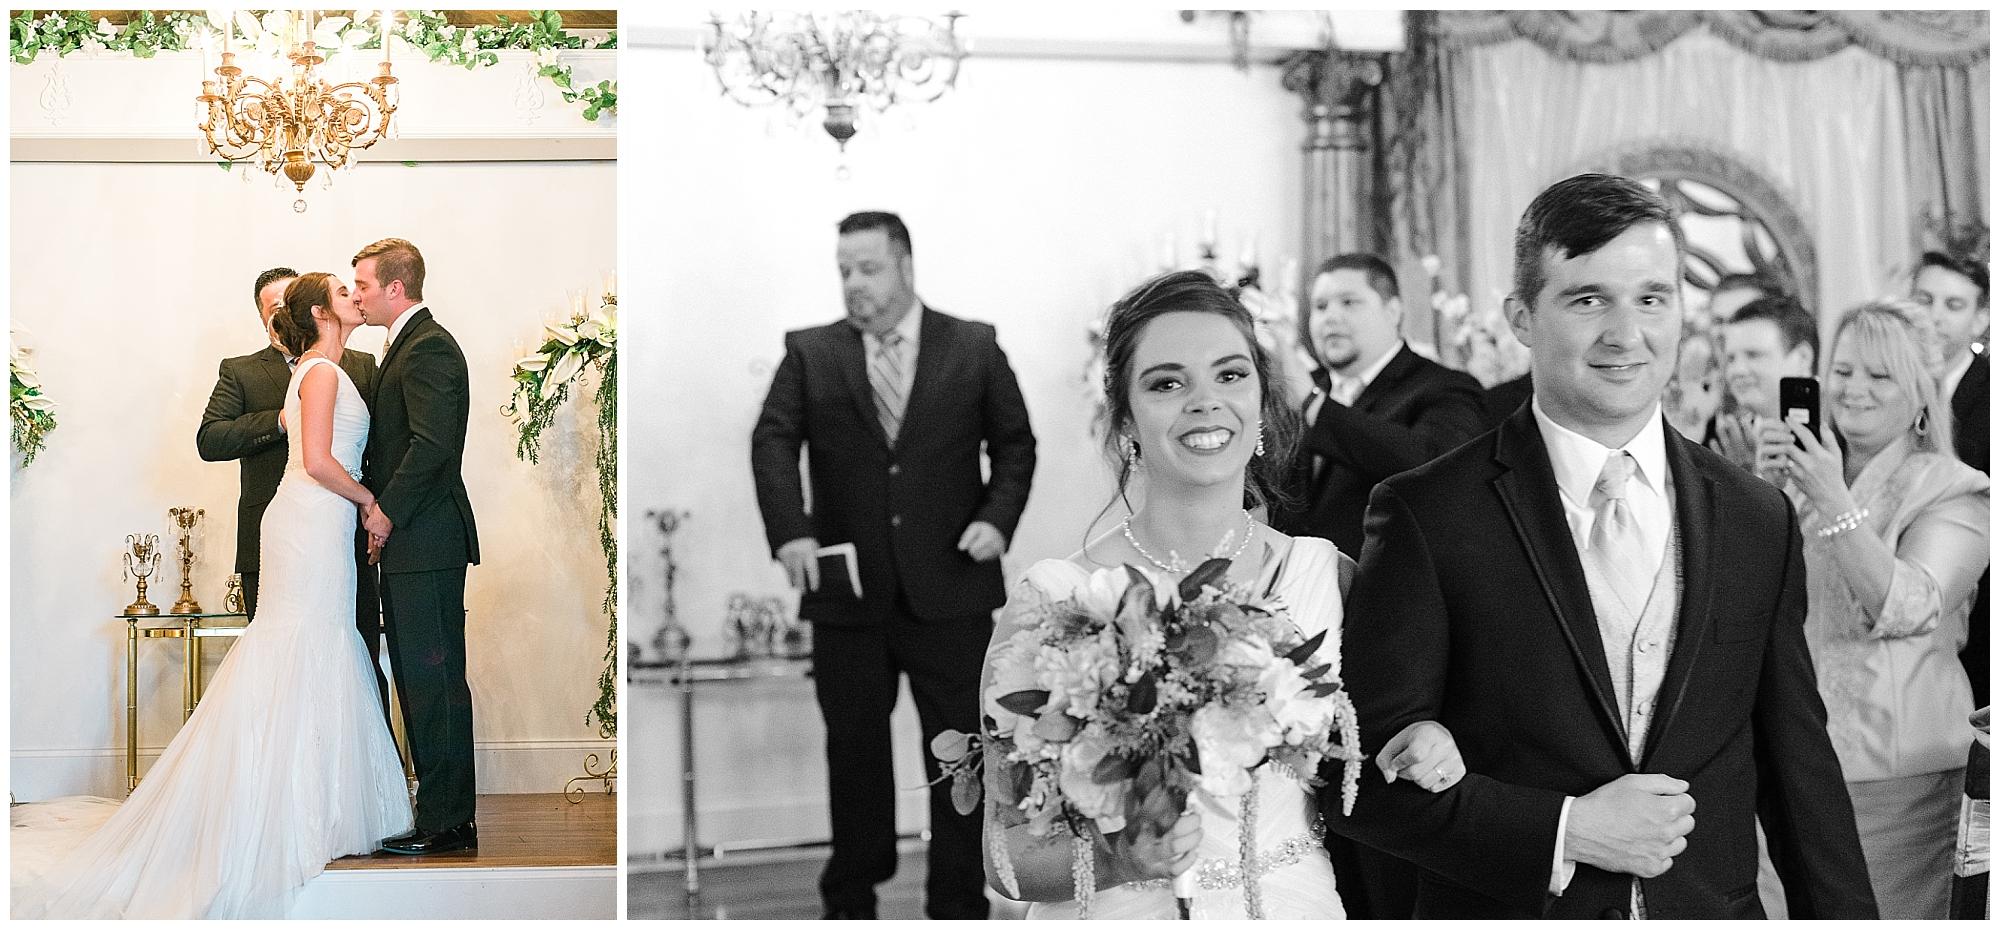 Nicholasville, KY wedding photographers